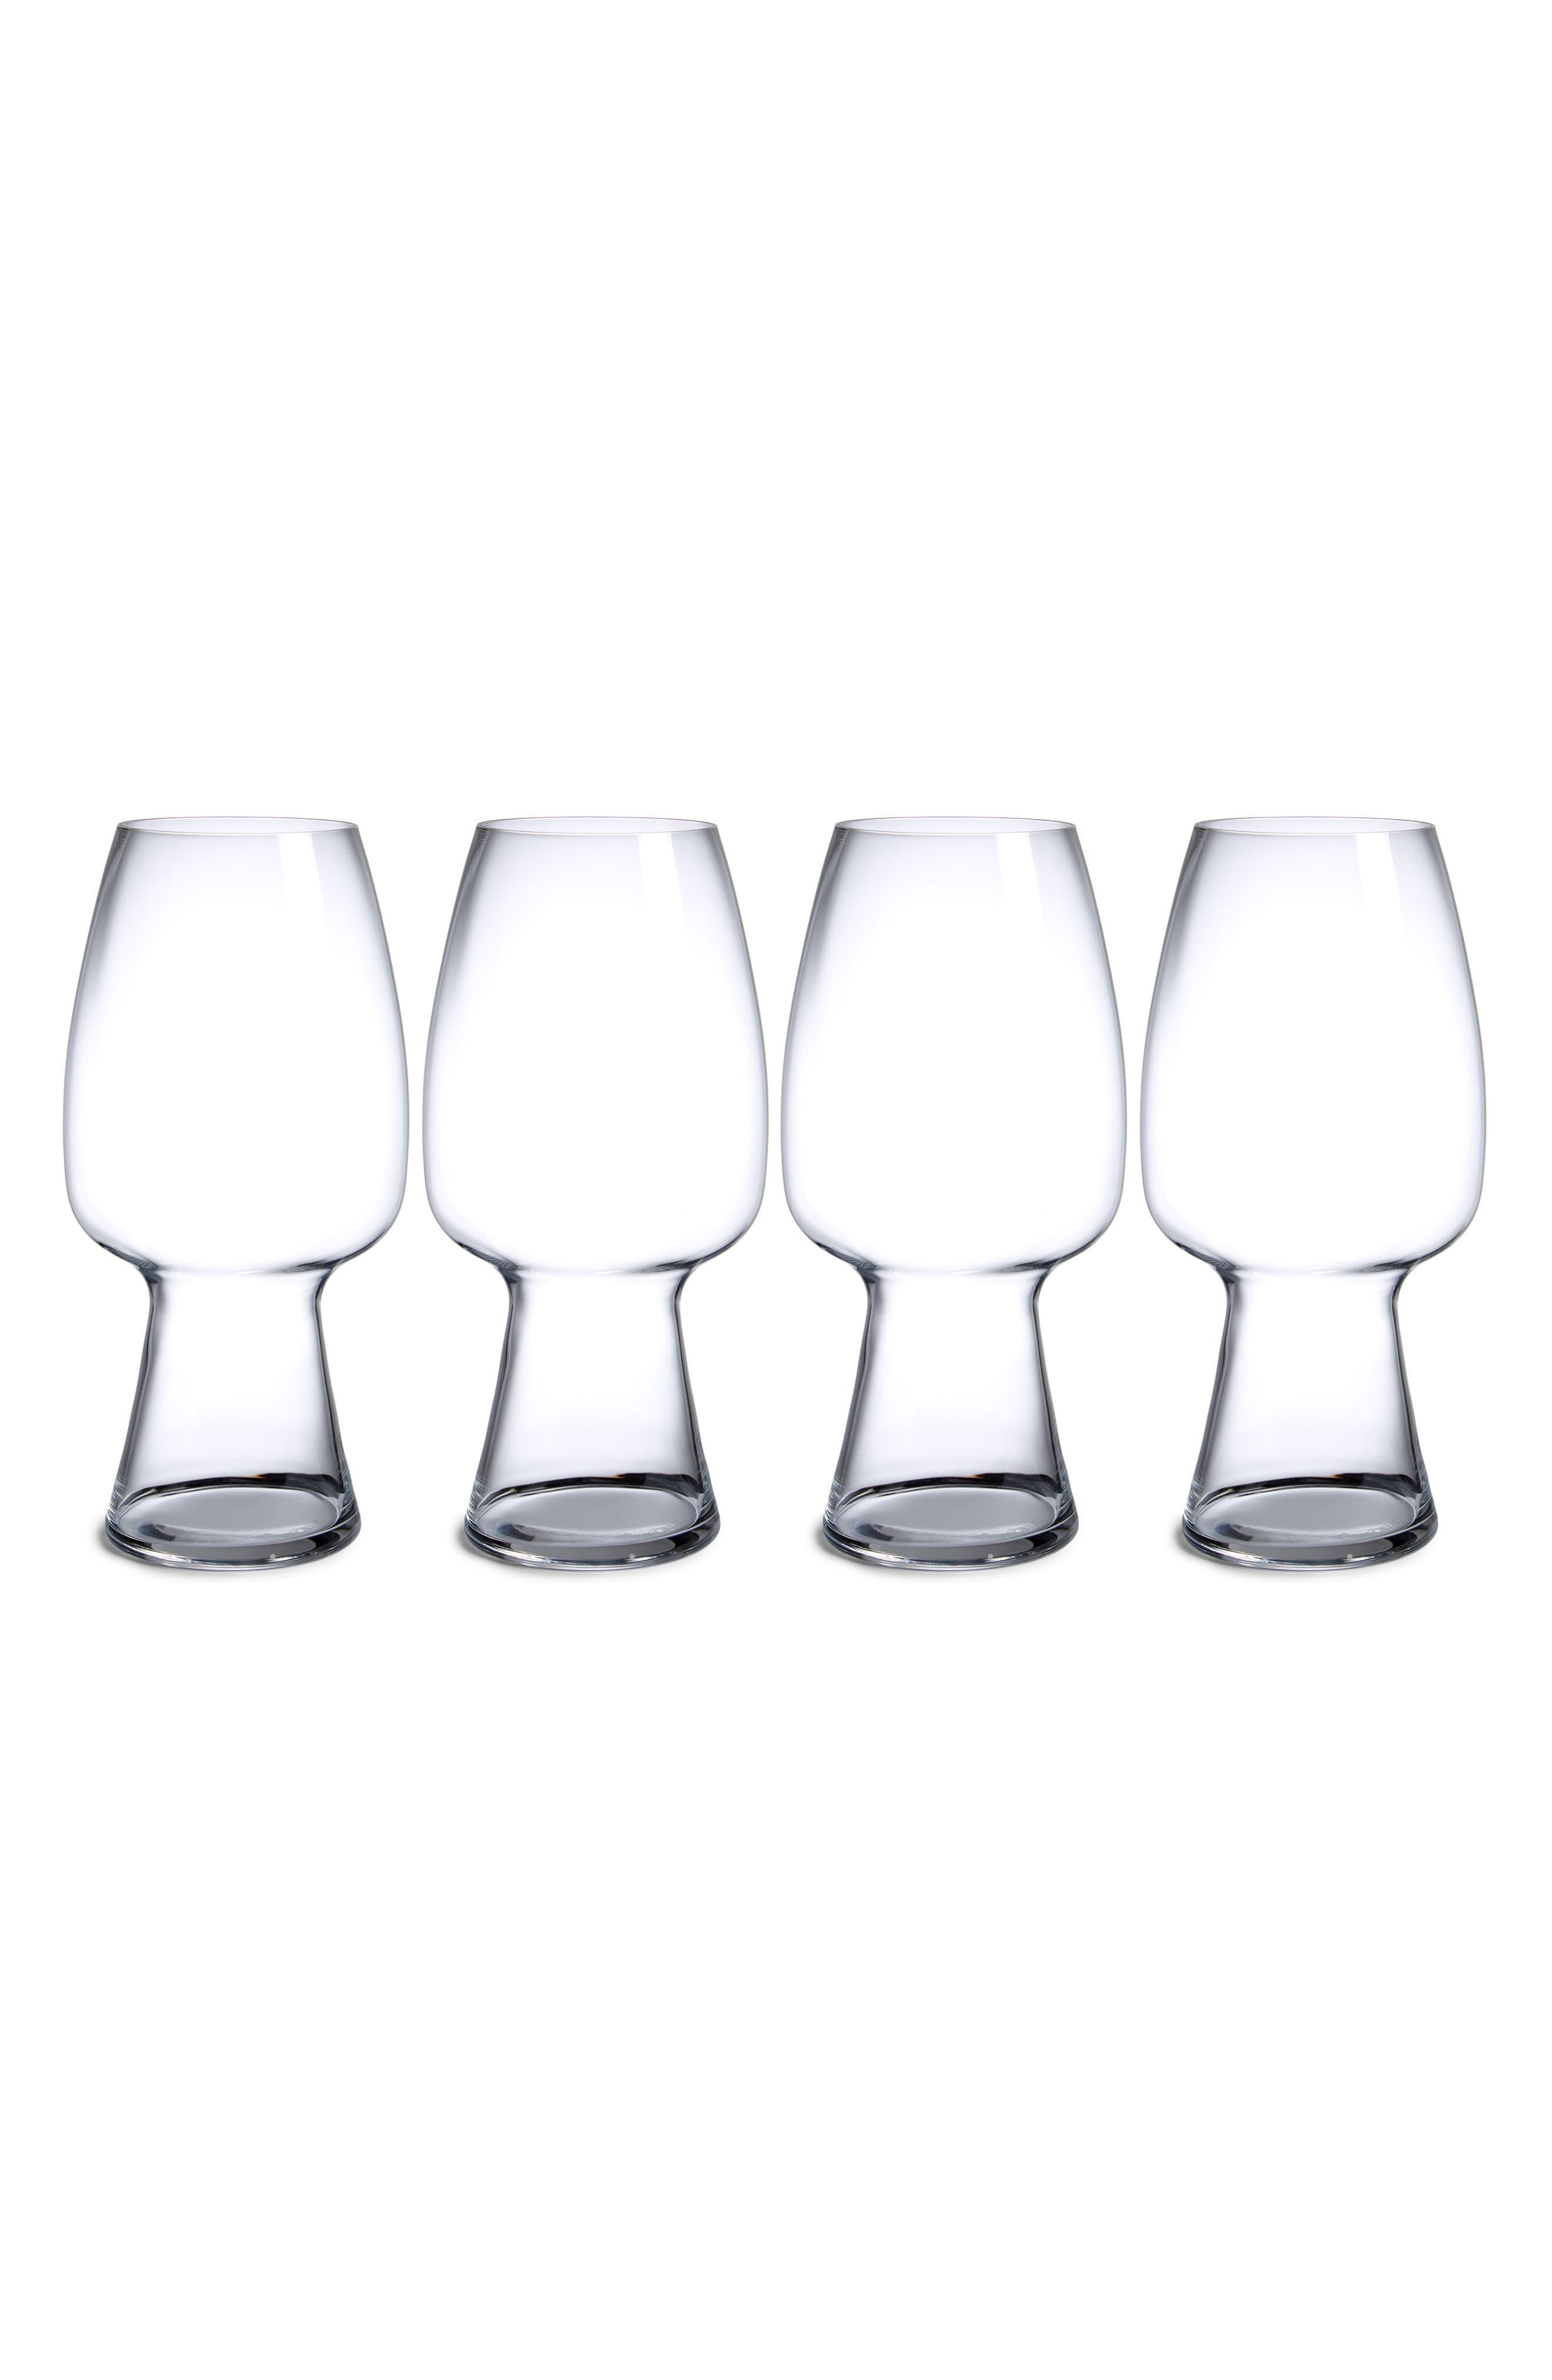 Set of 4 Stout Glasses,                             Main thumbnail 1, color,                             100